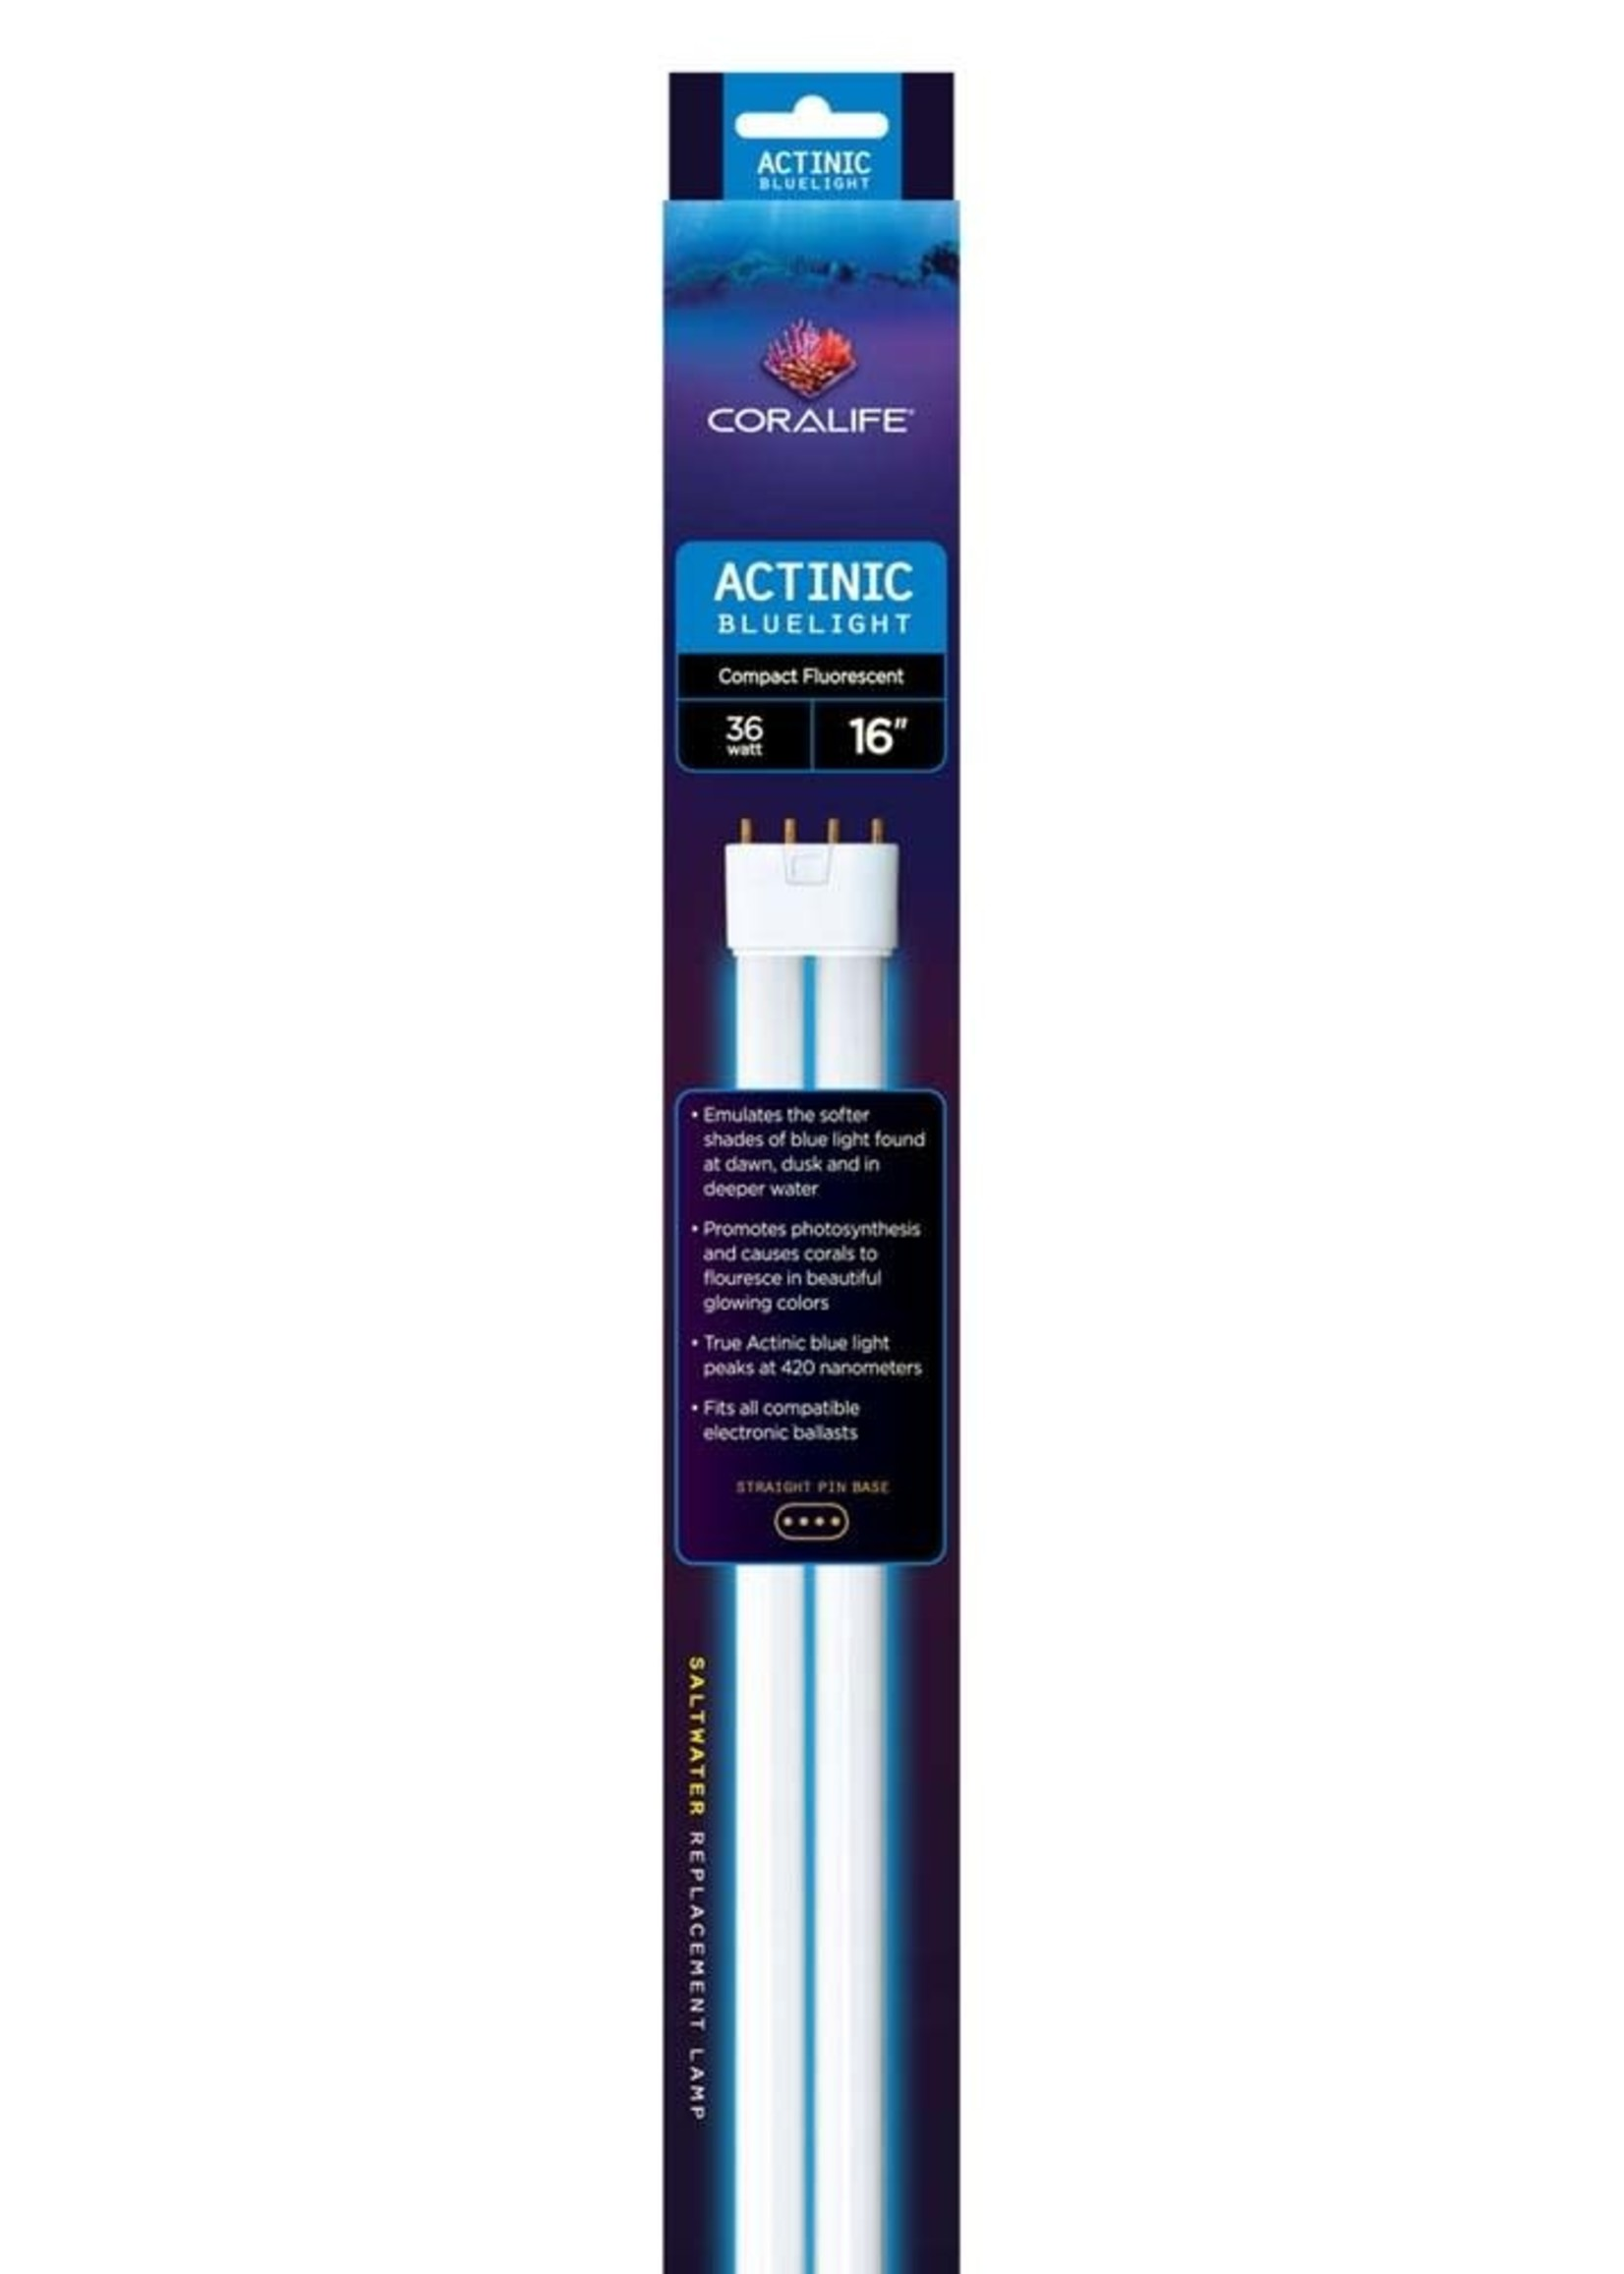 Central Aquatics/Aqueon Coralife Actinic Bluelight Compact Fluorescent Straight Pin Base Lamp 36W 16in